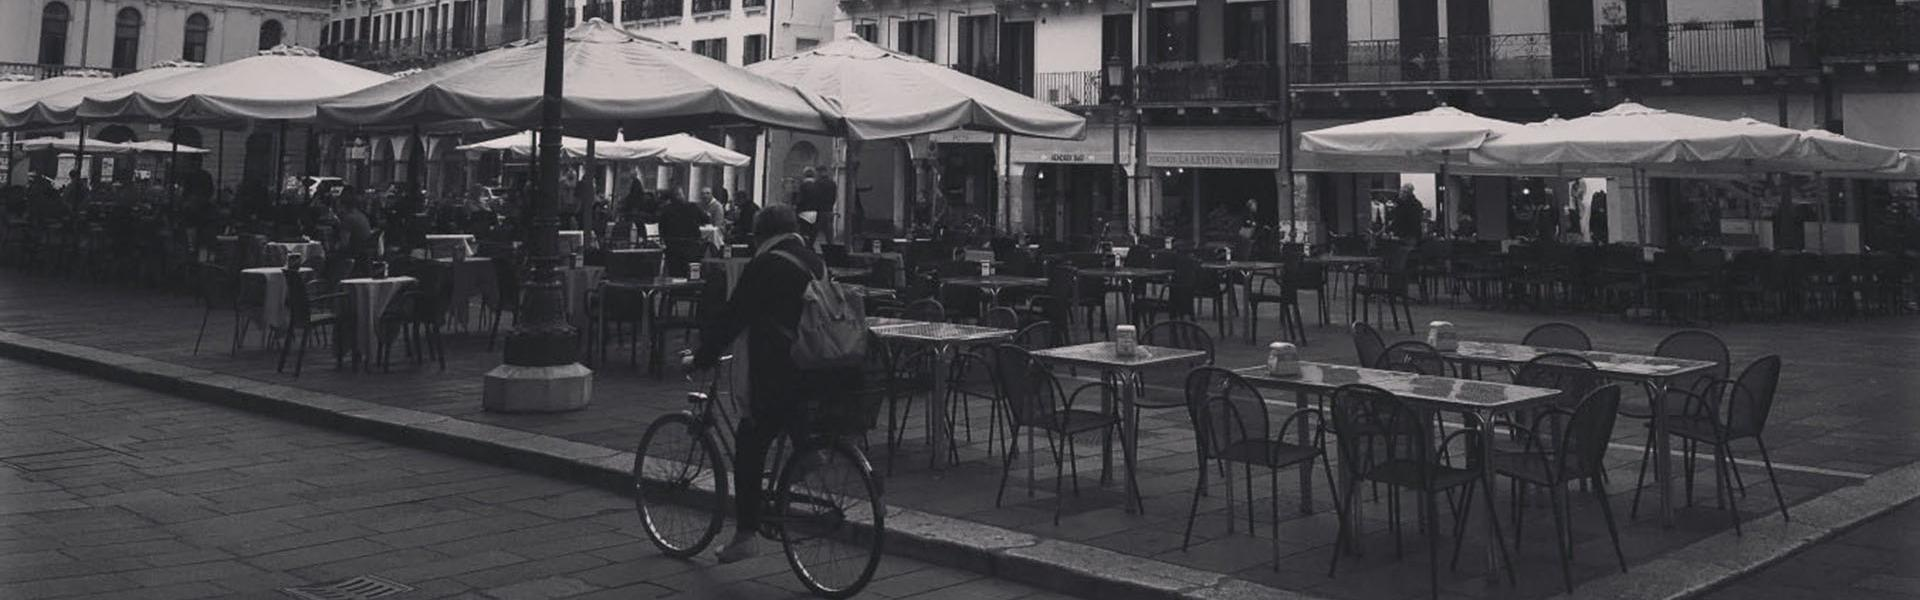 Padova Travel Bike ©Barbara Quartiani